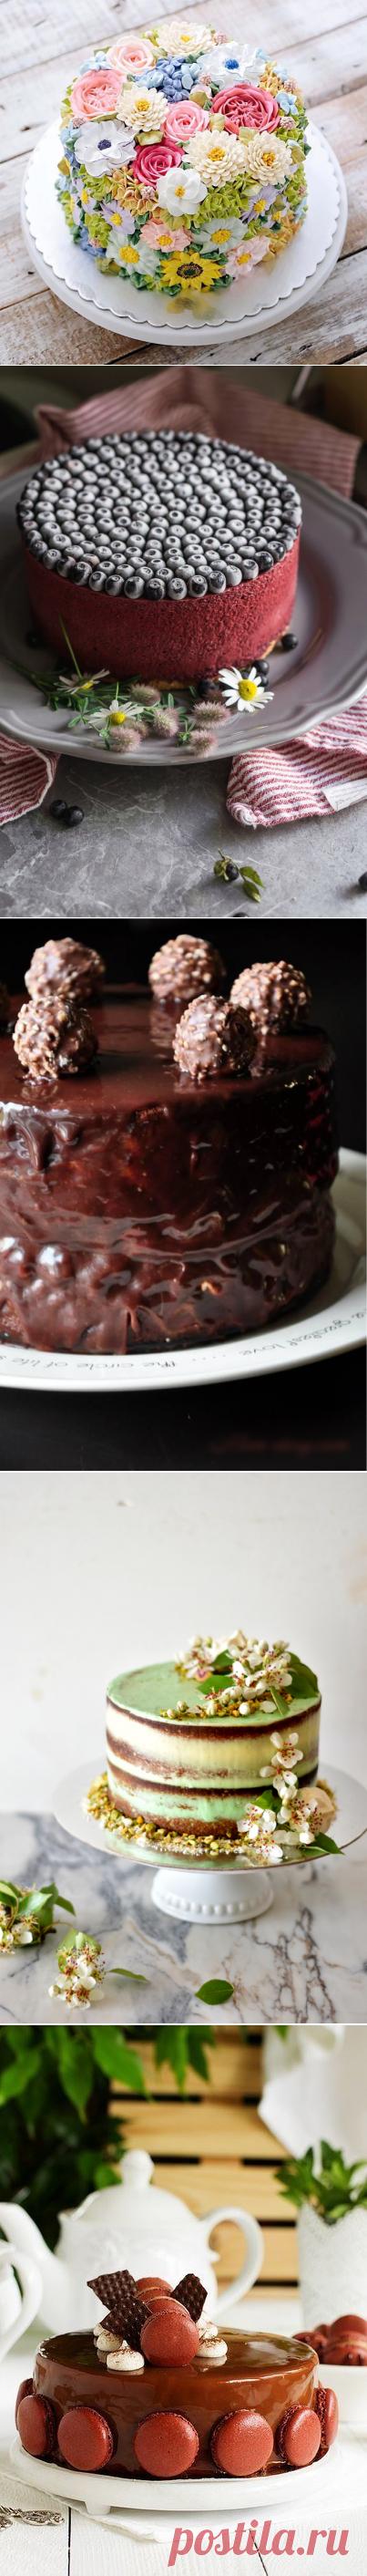 Изысканные торты — vellamonik